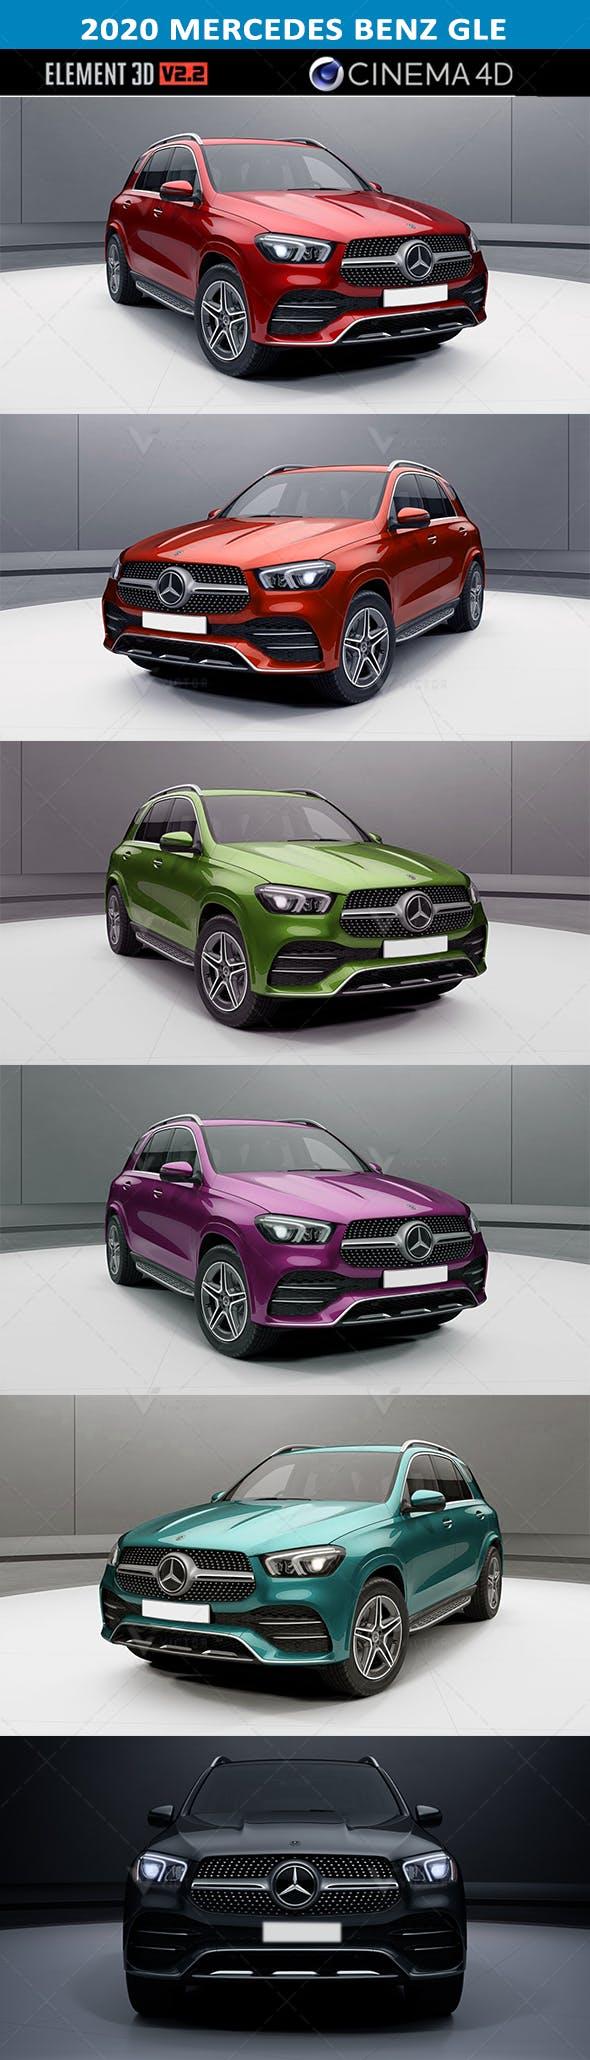 ELEMENT 3D V2 2020 Mercedes Benz GLE. (All colors) - 3DOcean Item for Sale